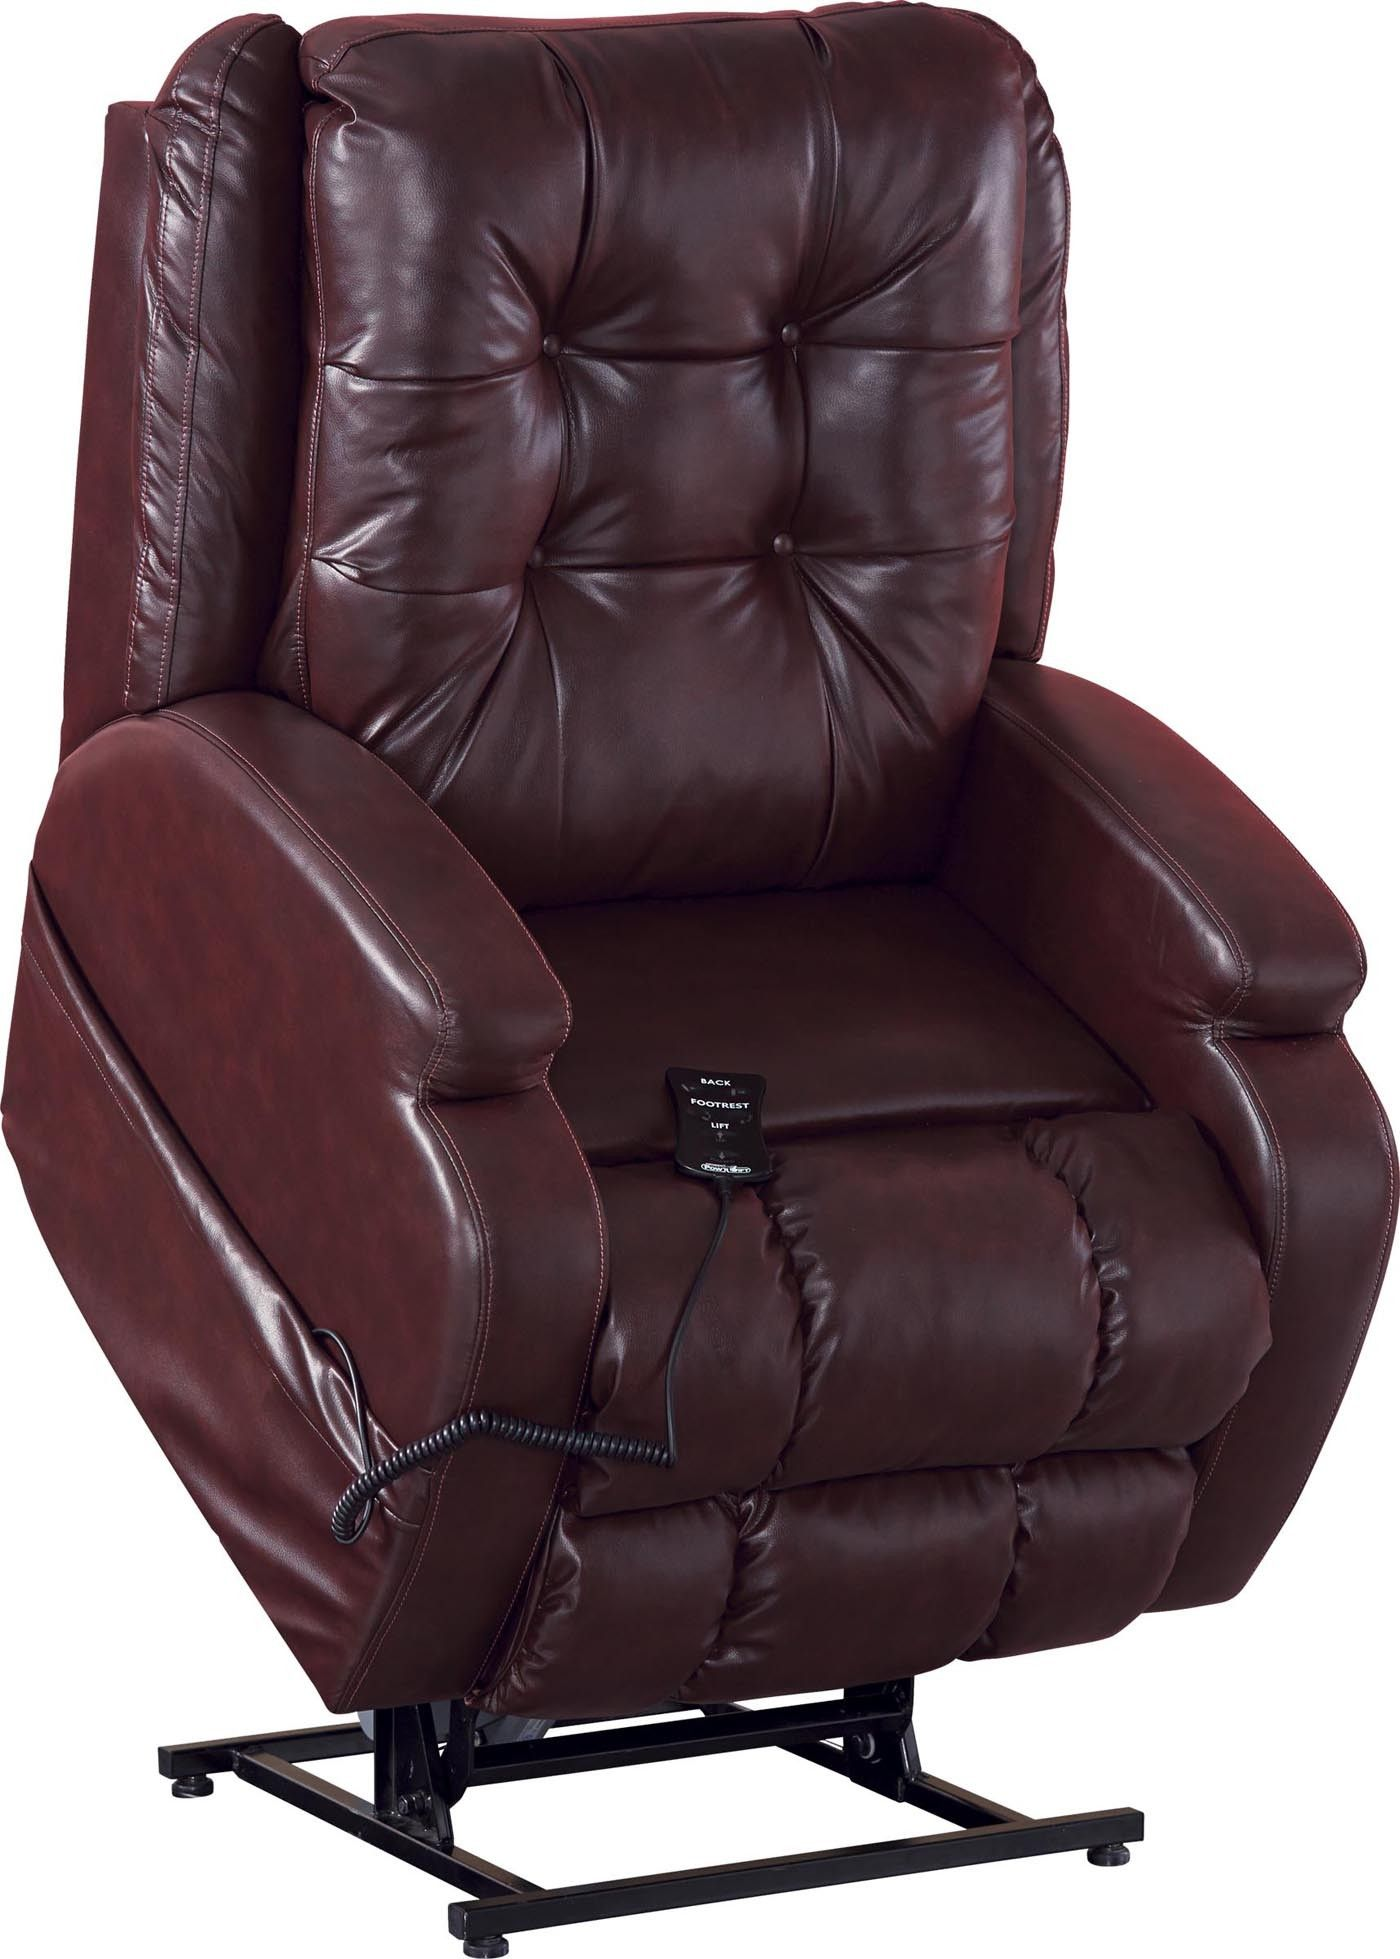 Catnapper Jenson Dual Motor Power Lift Chair Recliner 4855